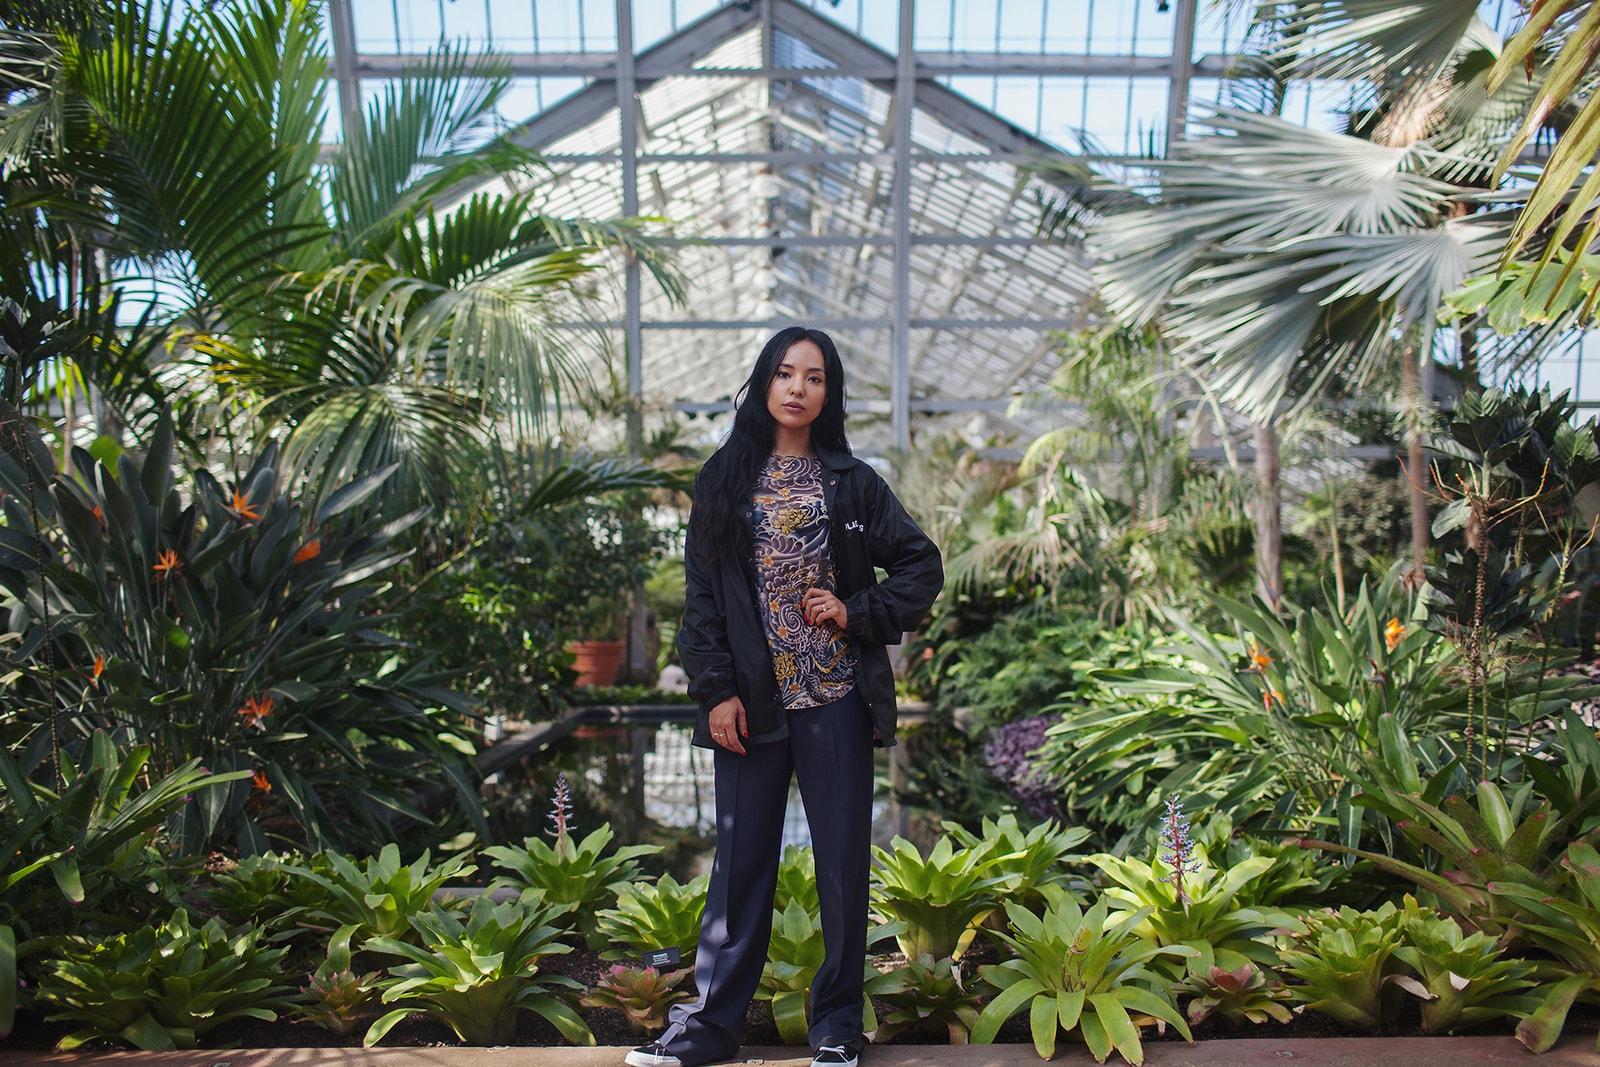 Elizabeth De La Piedra Smart Yehme2 Chicago City Guide Photographer Alcala's Fishtail Neon Garfield Park Conservatory Instagram